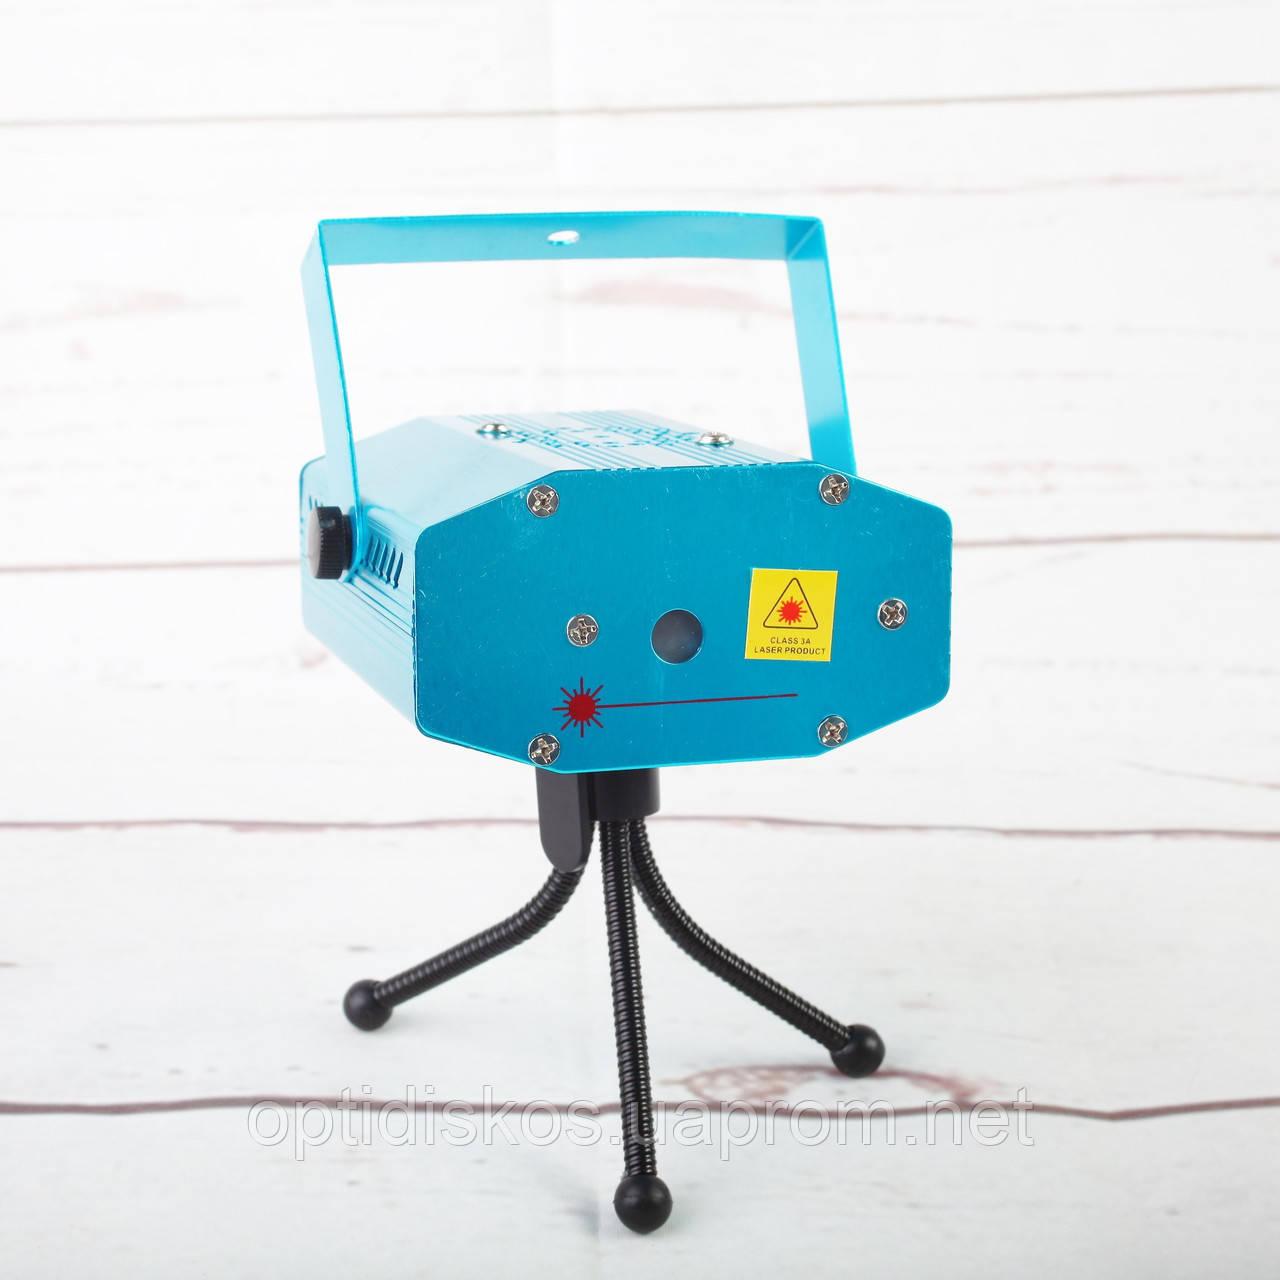 Лазерный проектор Laser 6 in 1